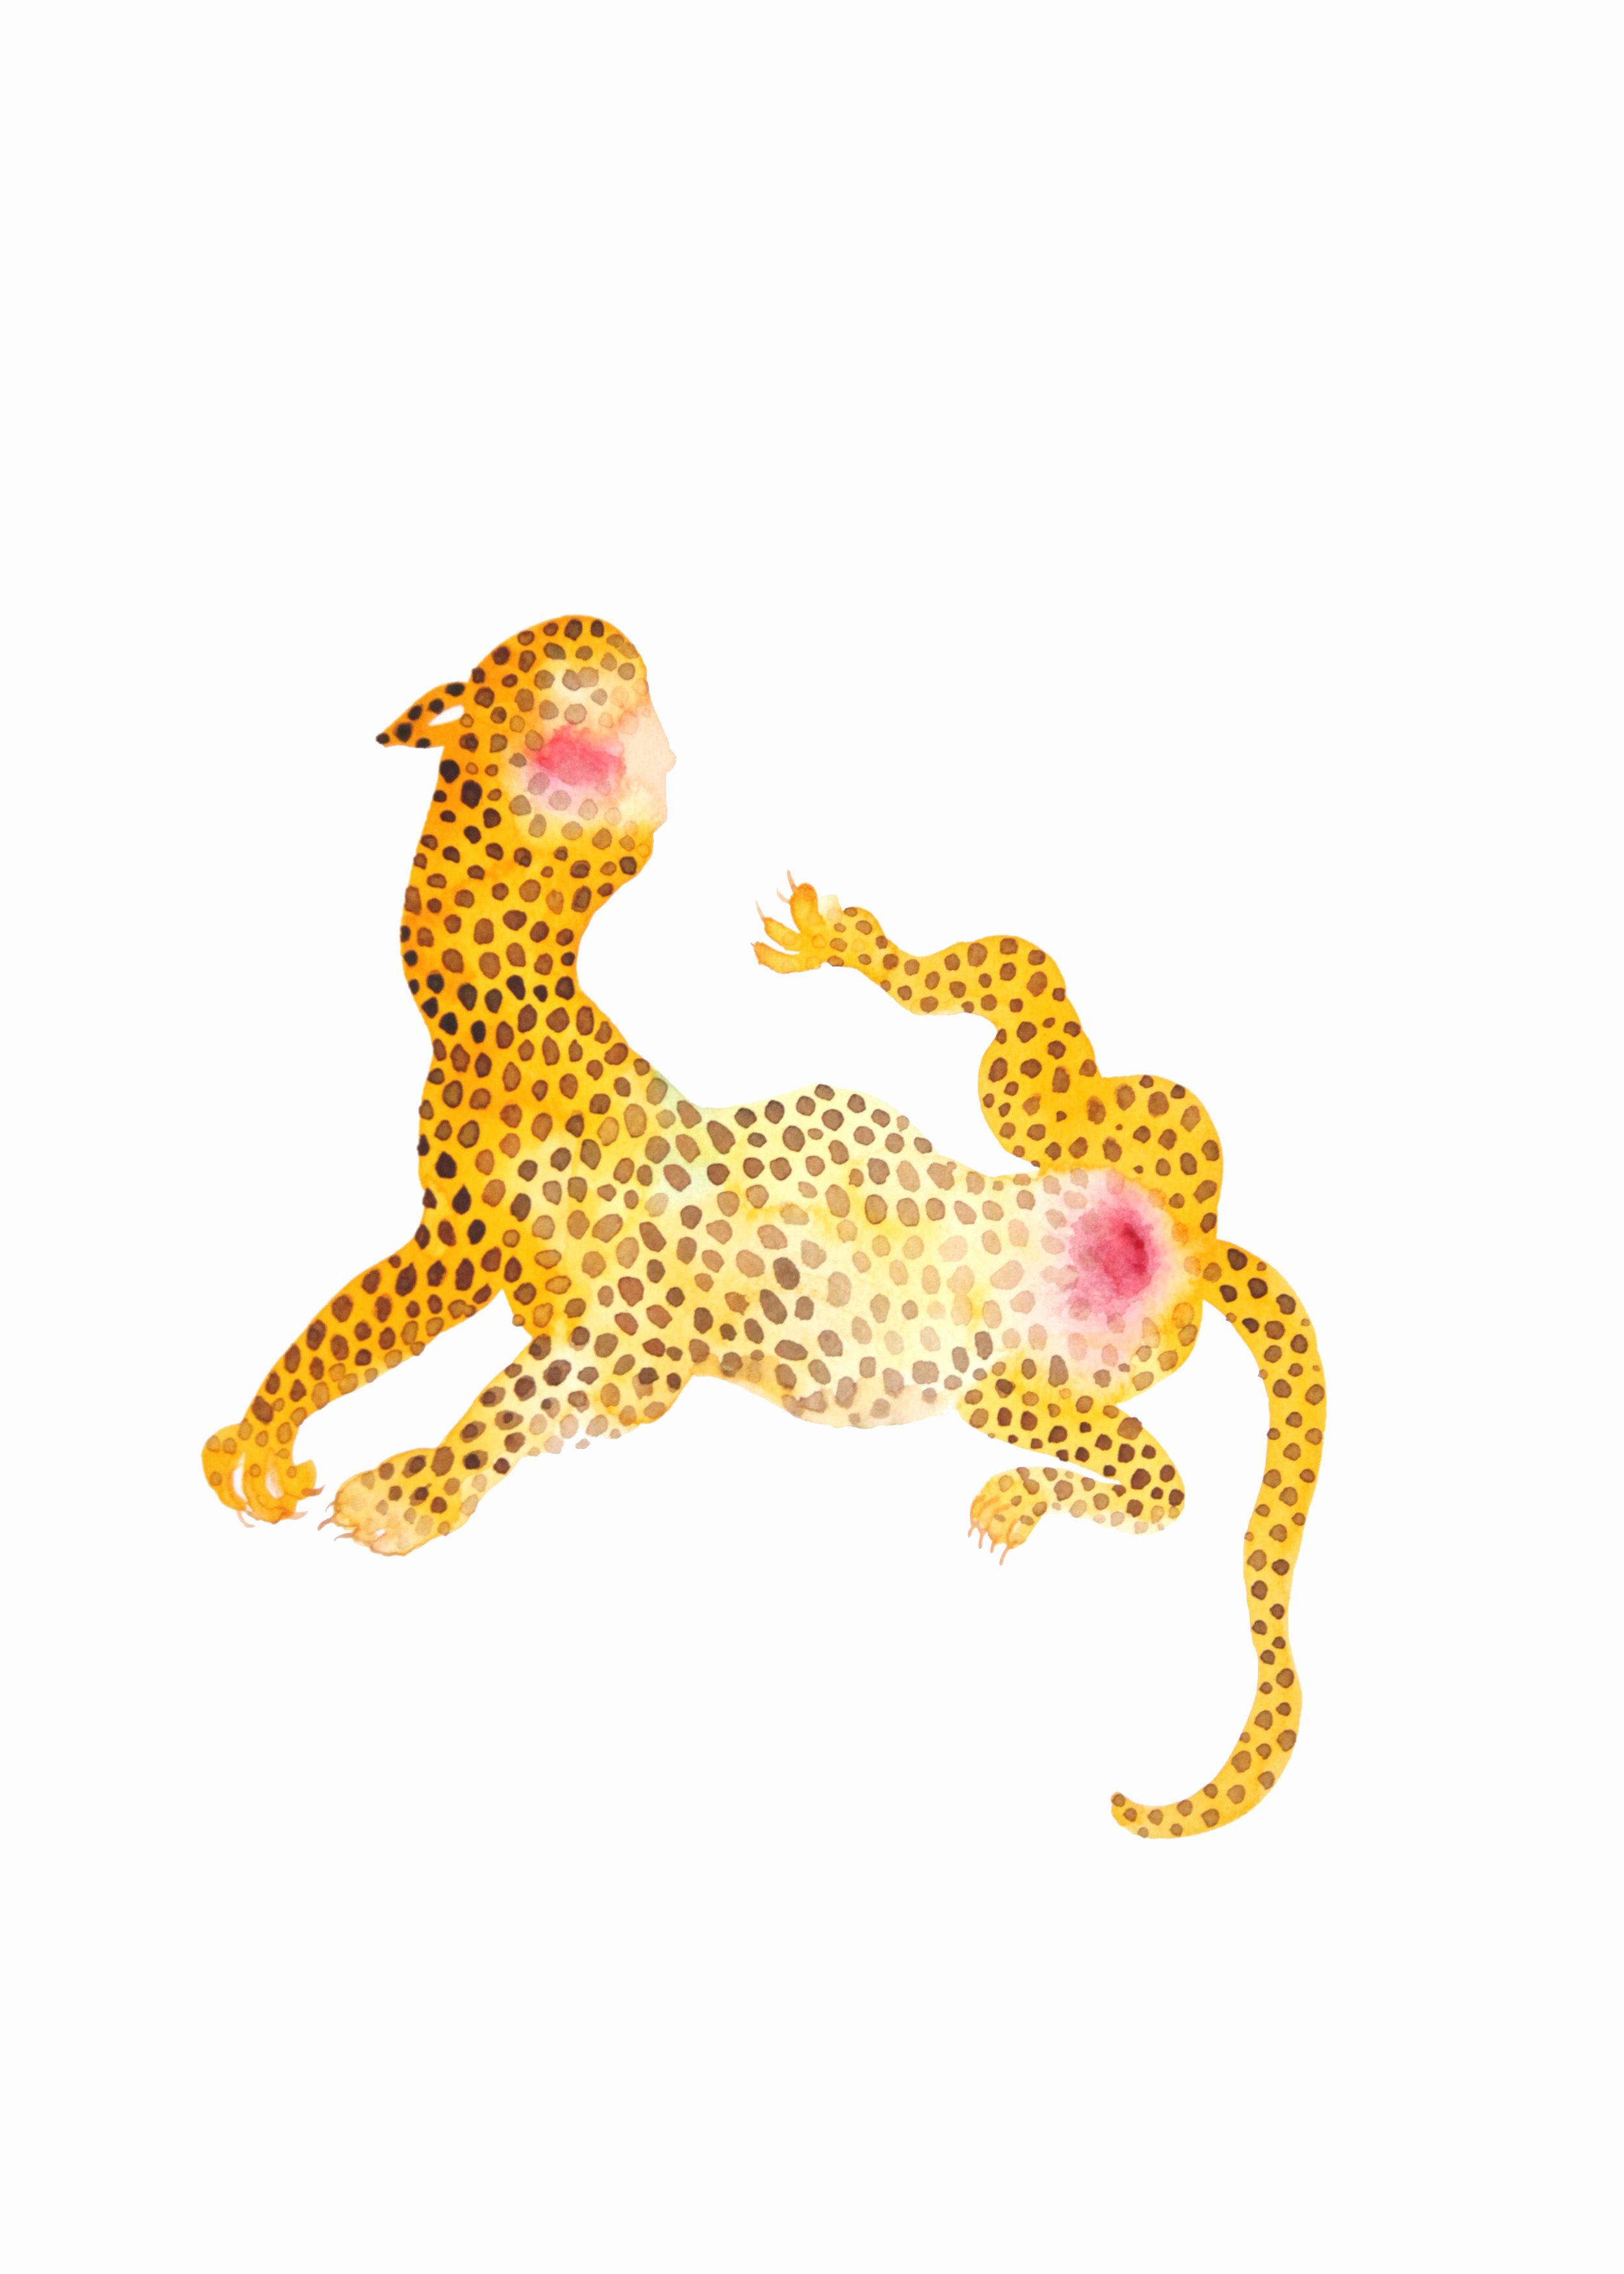 Leopard  , 2016, watercolor on paper, 40x30cm